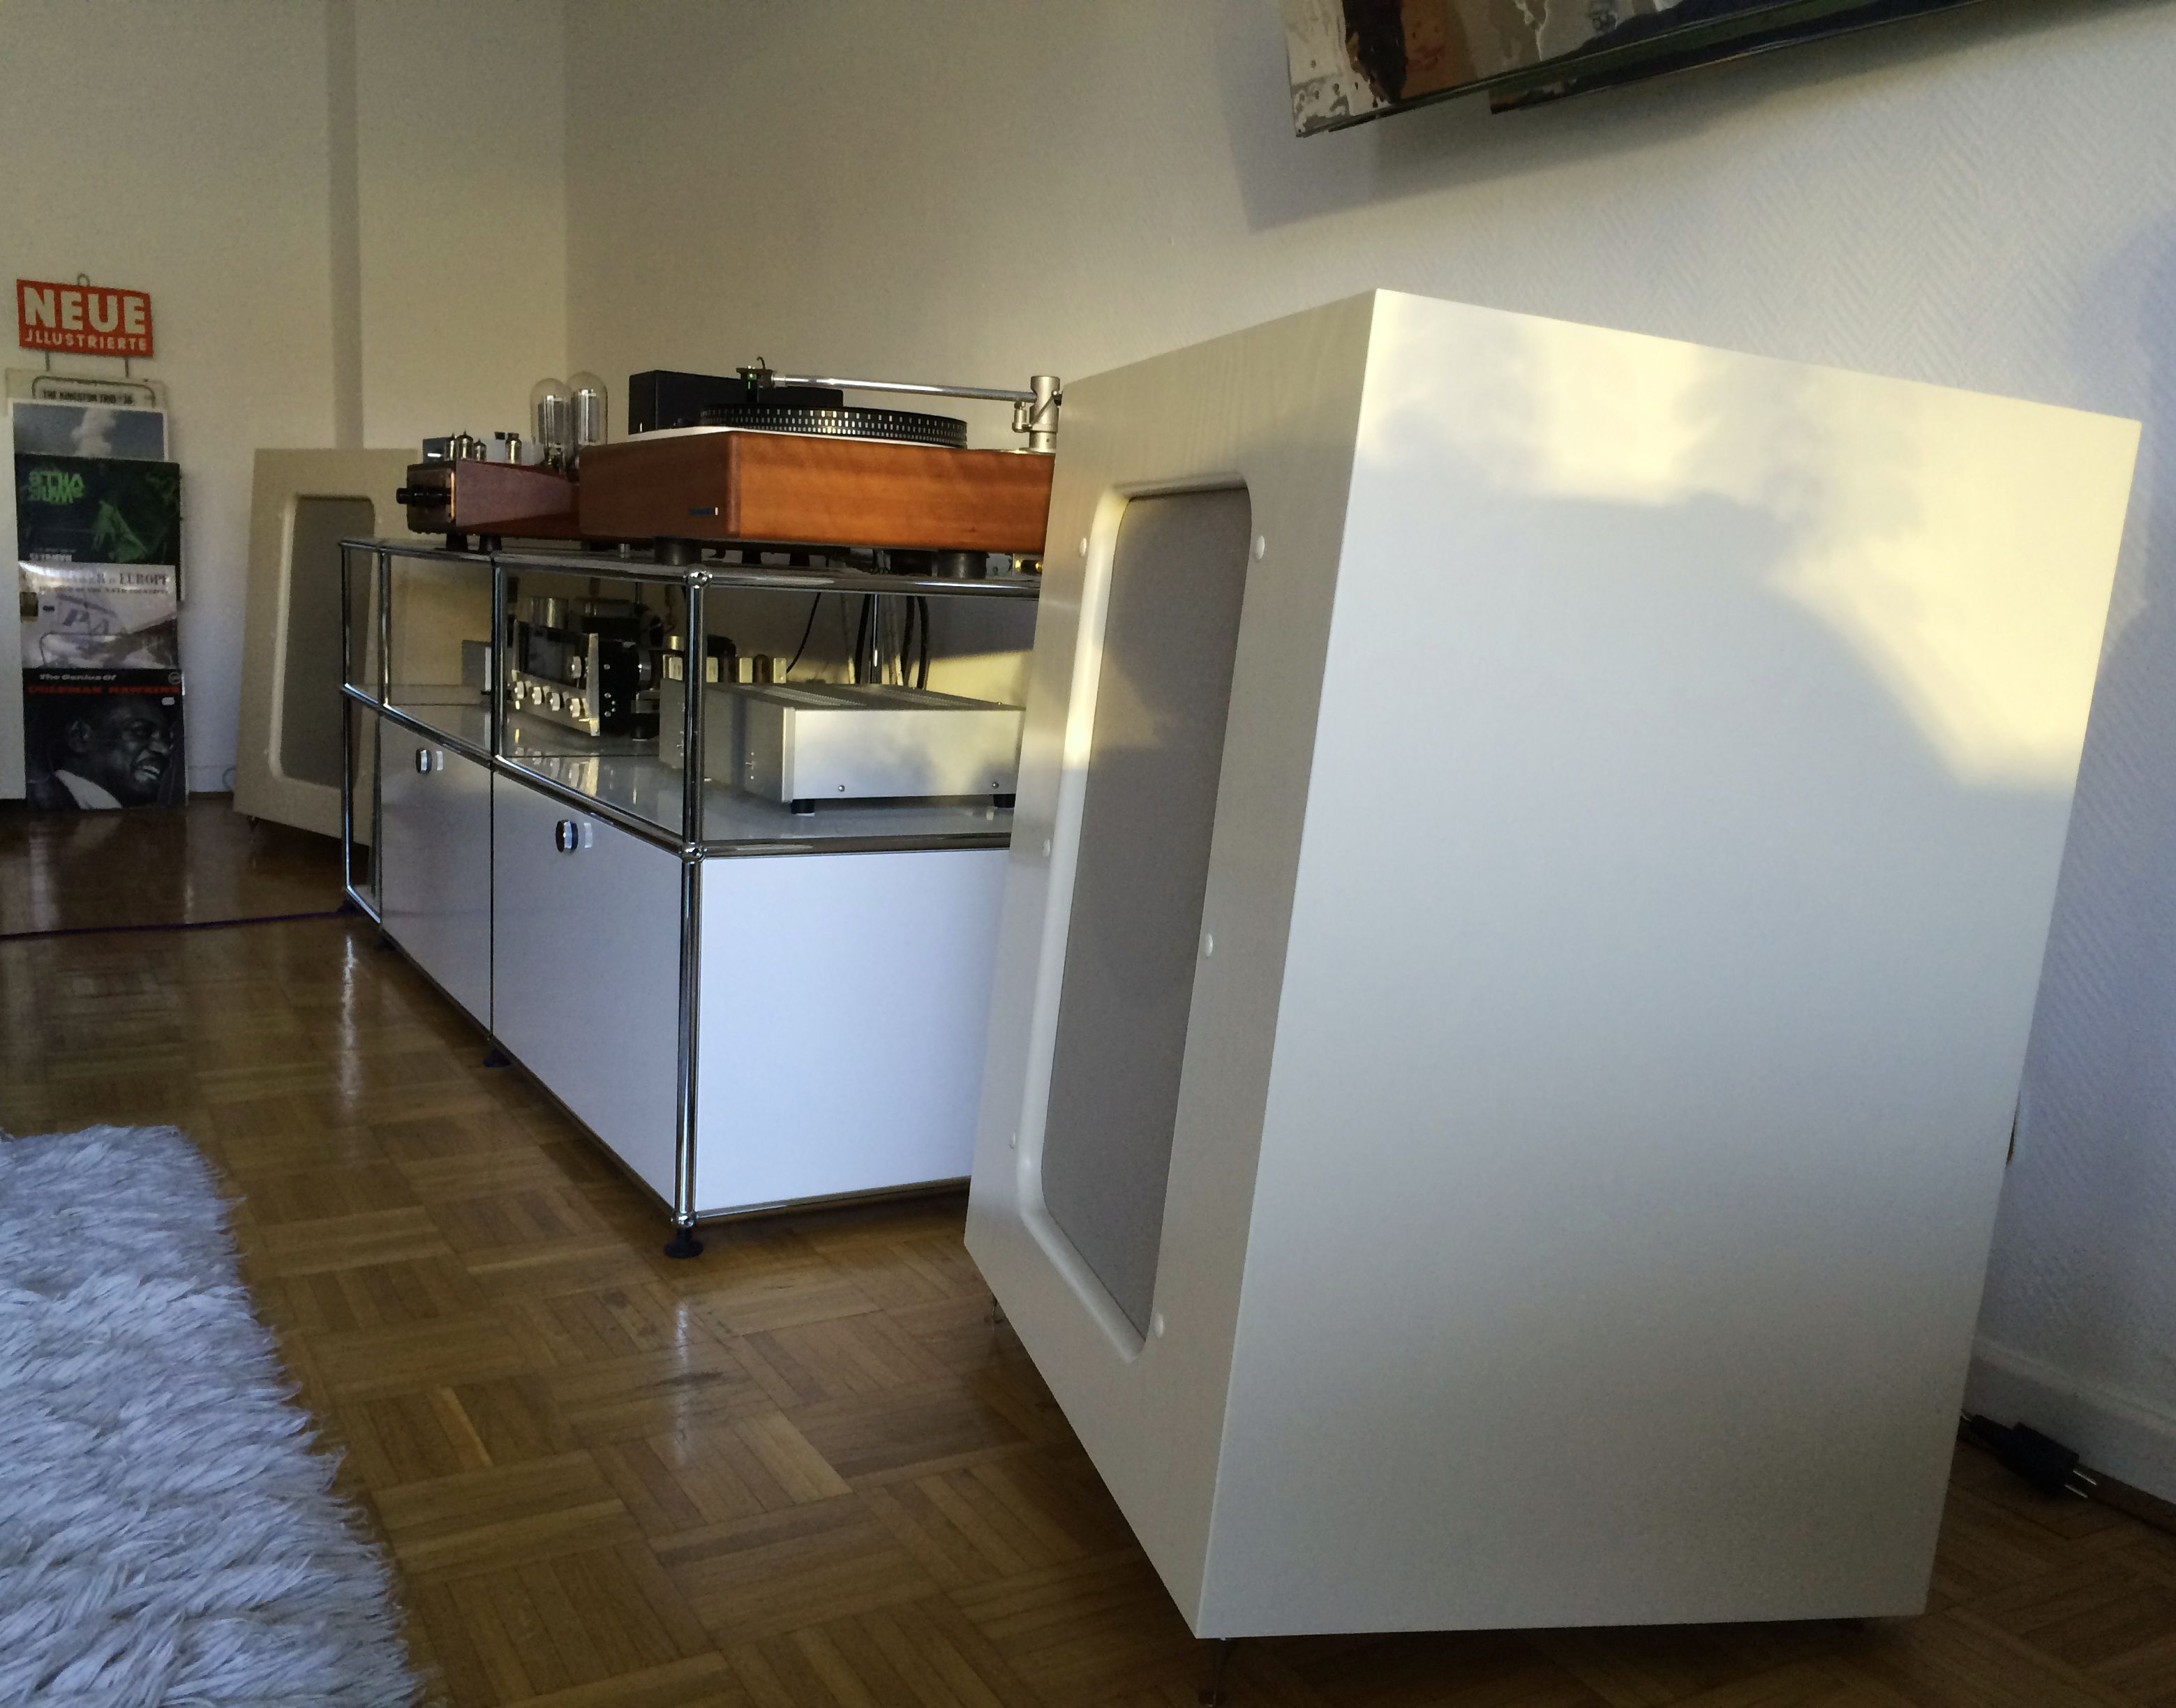 altec gerrard 301 mc intosh mr67 acousticplan silvaweld usm haller vintage audio live. Black Bedroom Furniture Sets. Home Design Ideas